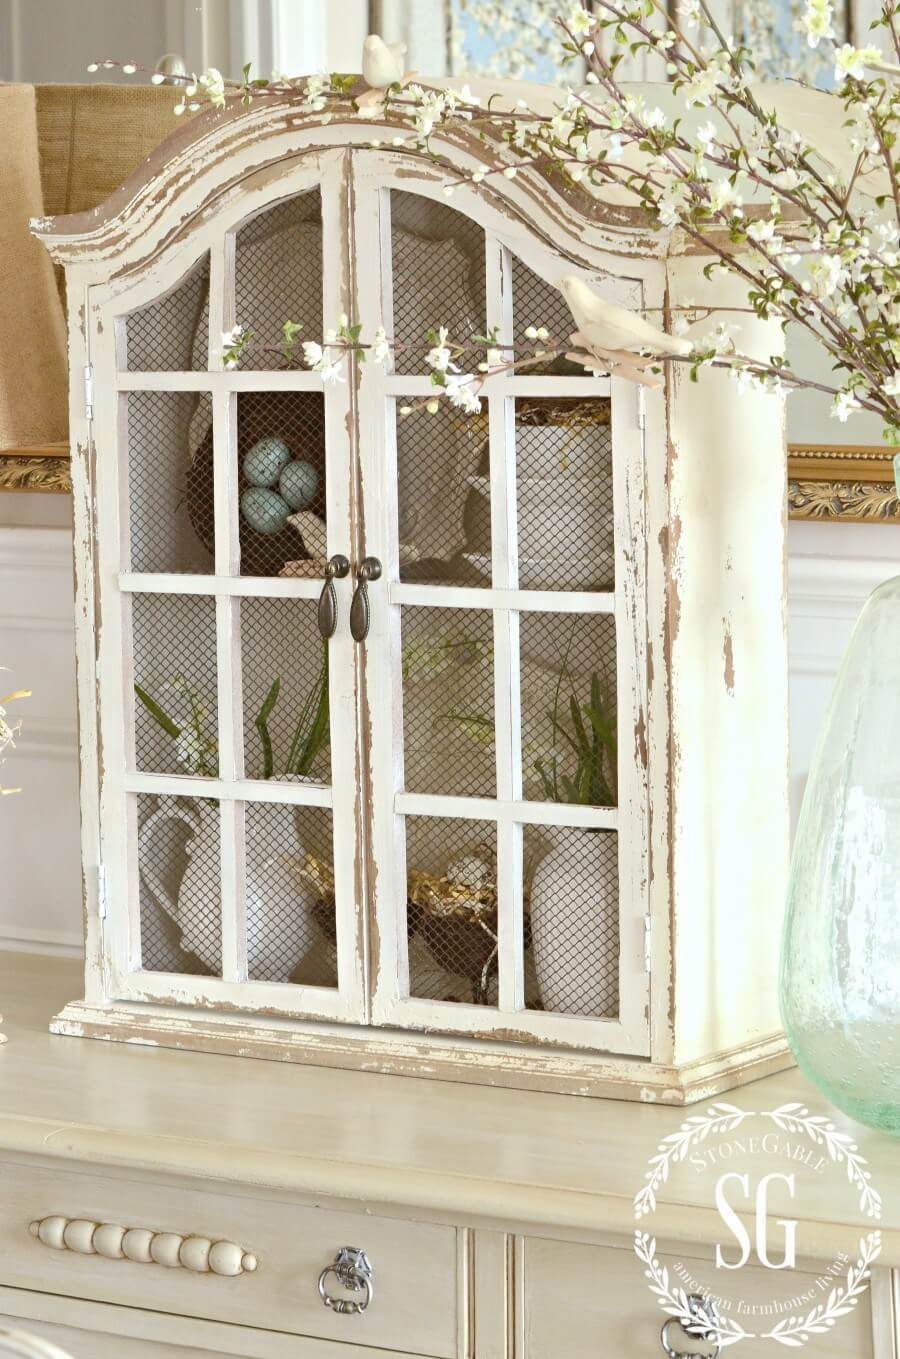 Rustic Cabinet with Flower Arrangements